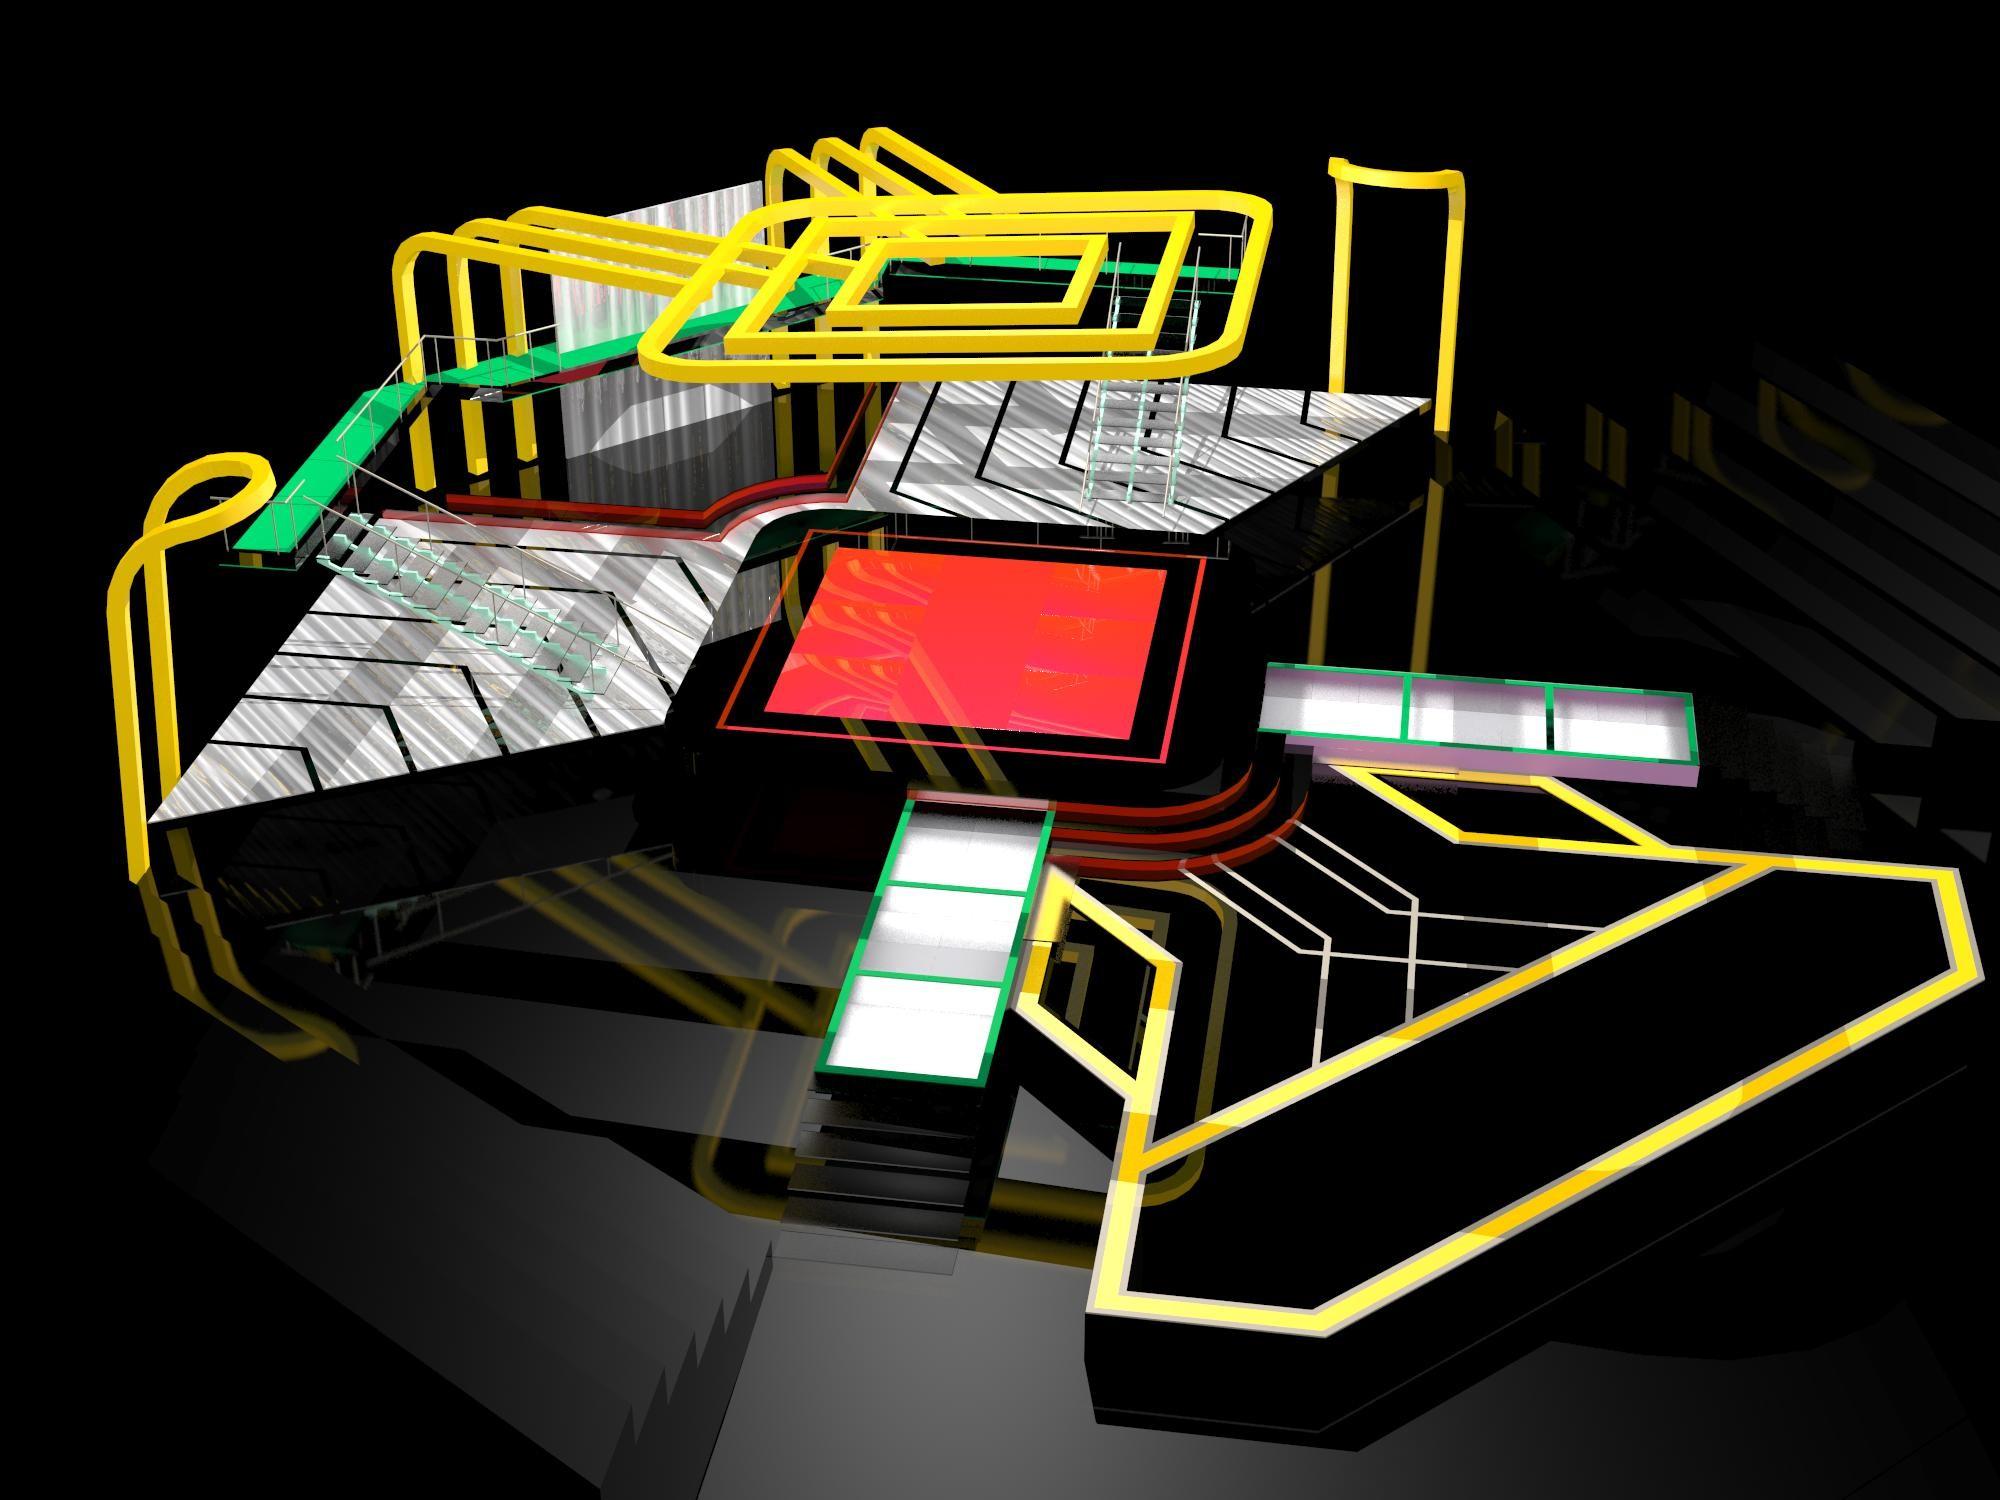 016-entertainment-tv studio set design-1.jpg